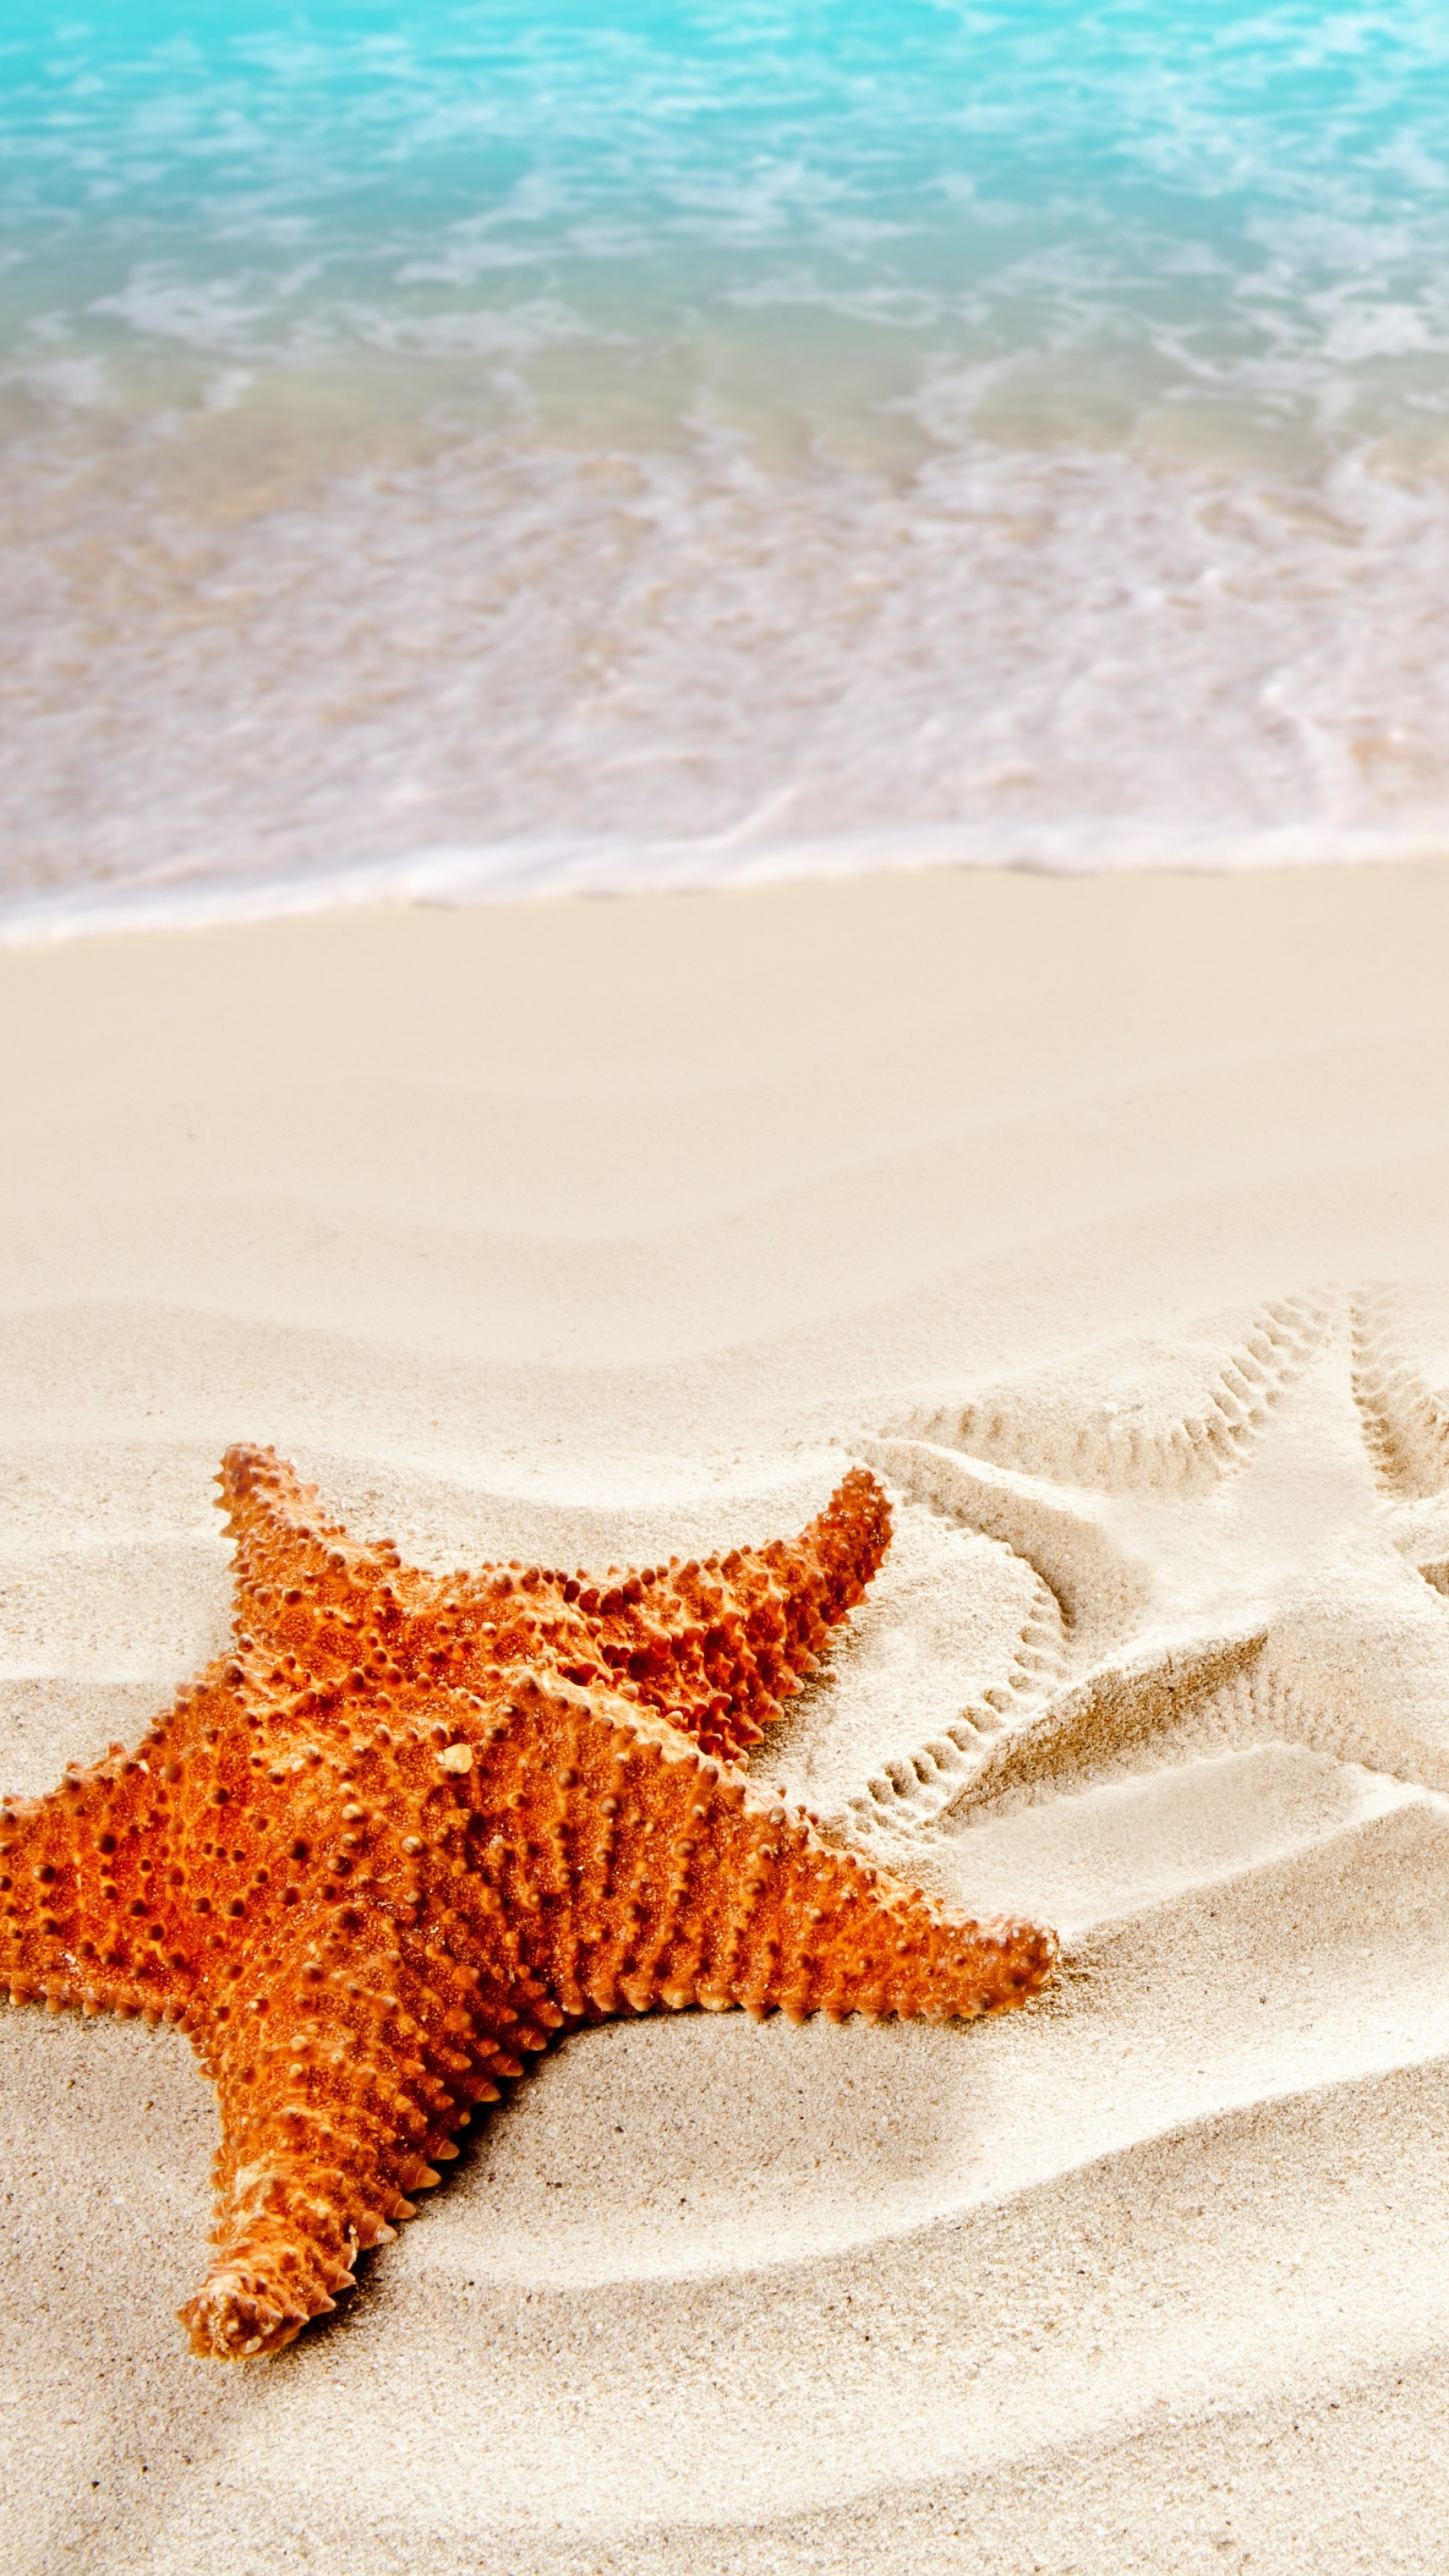 Love U Wallpapers With Quotes Wallpaper Sea 5k 4k Wallpaper Ocean Starfish Shore